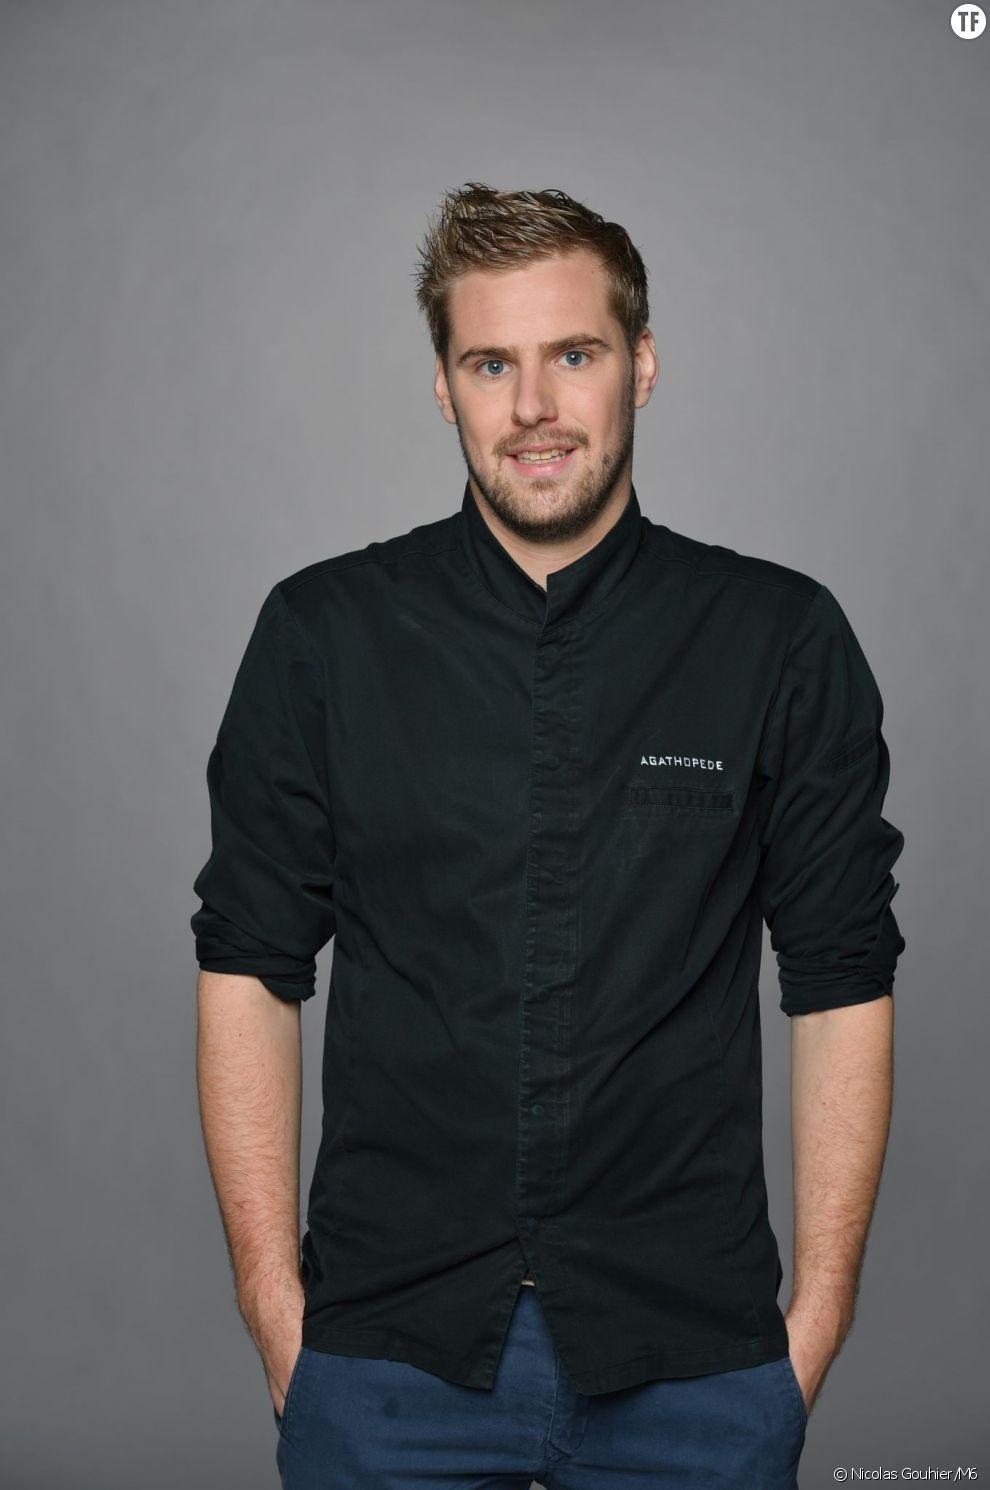 Top Chef 2018, Jérémy Vandernoot, 27 ans